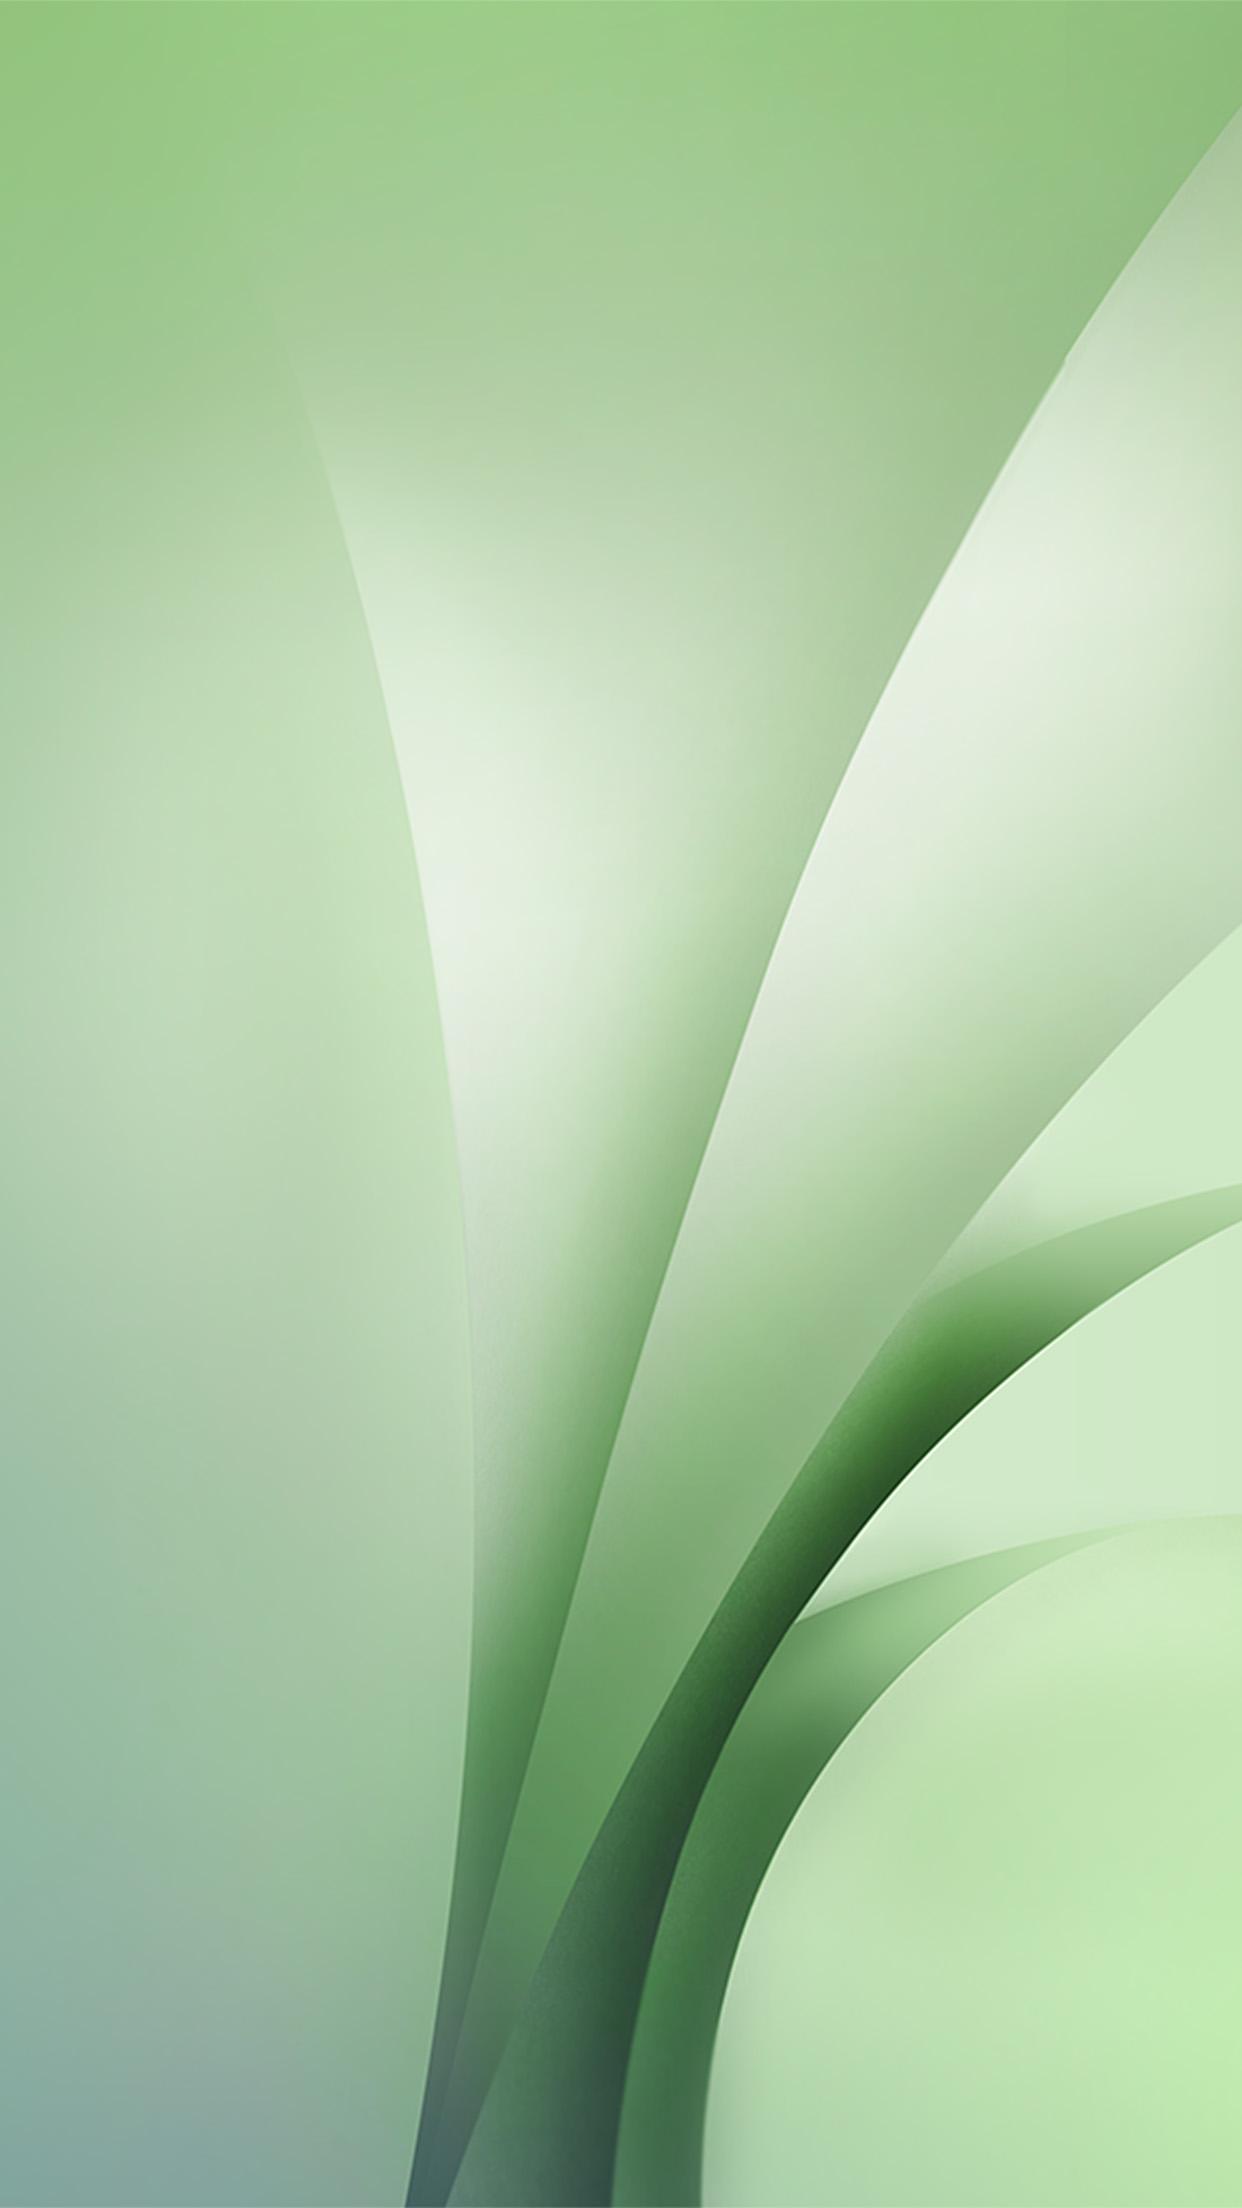 Vm56 Samsung Galaxy Abstract Green Pattern Wallpaper